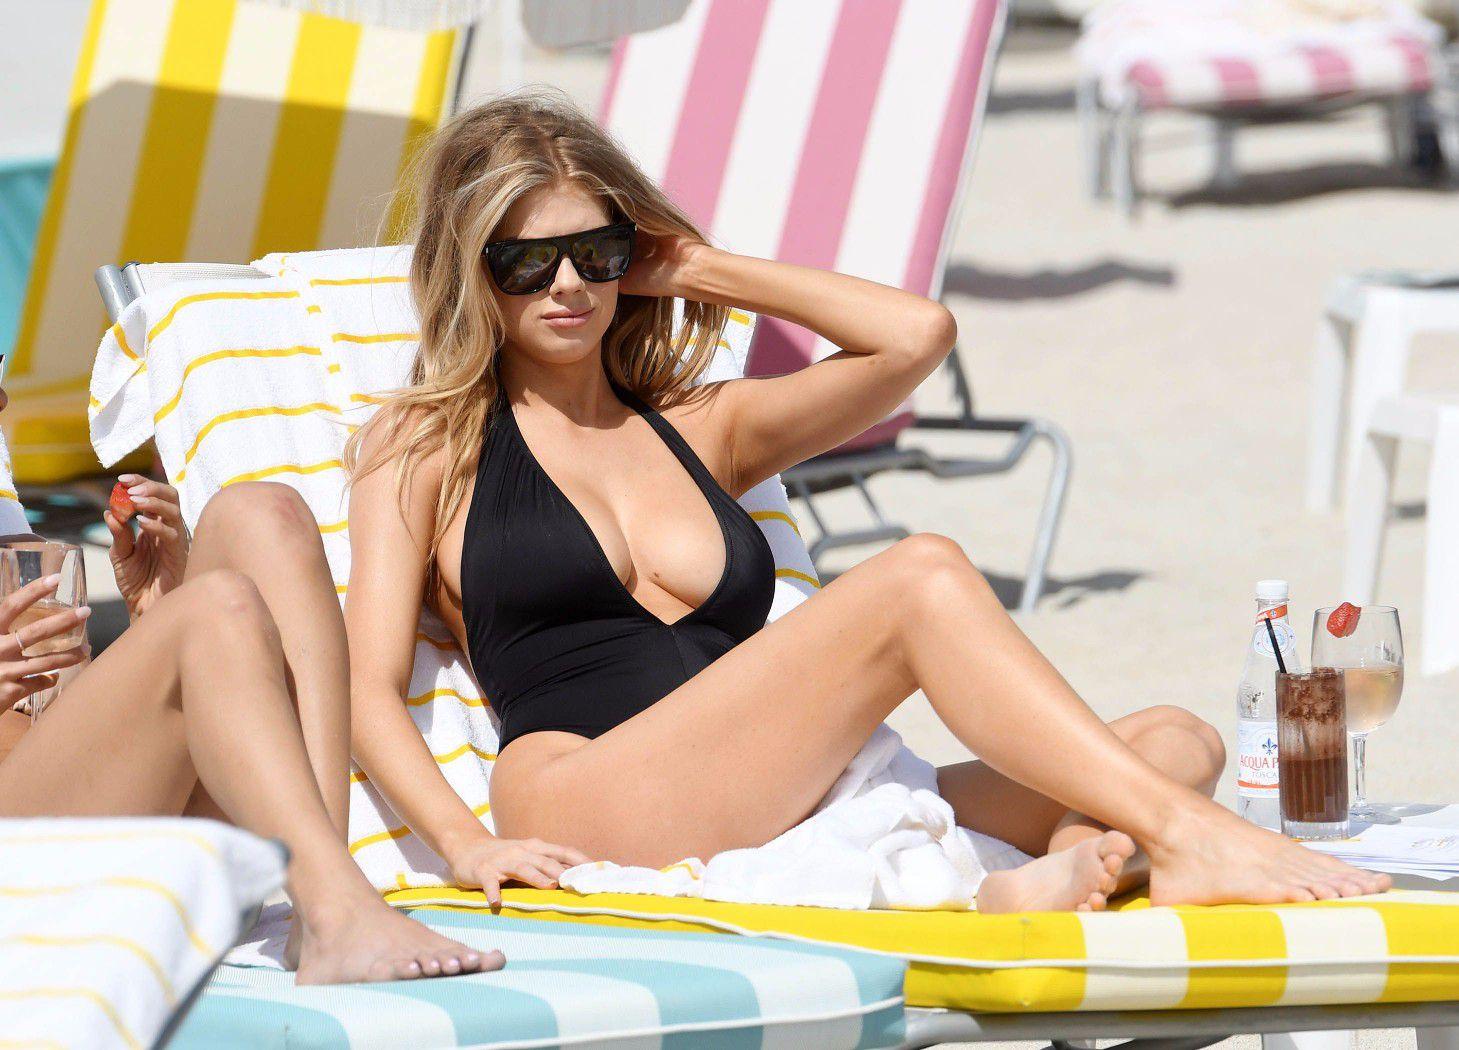 charlotte-mckinney-nipple-slip-at-the-beach-in-miami-38